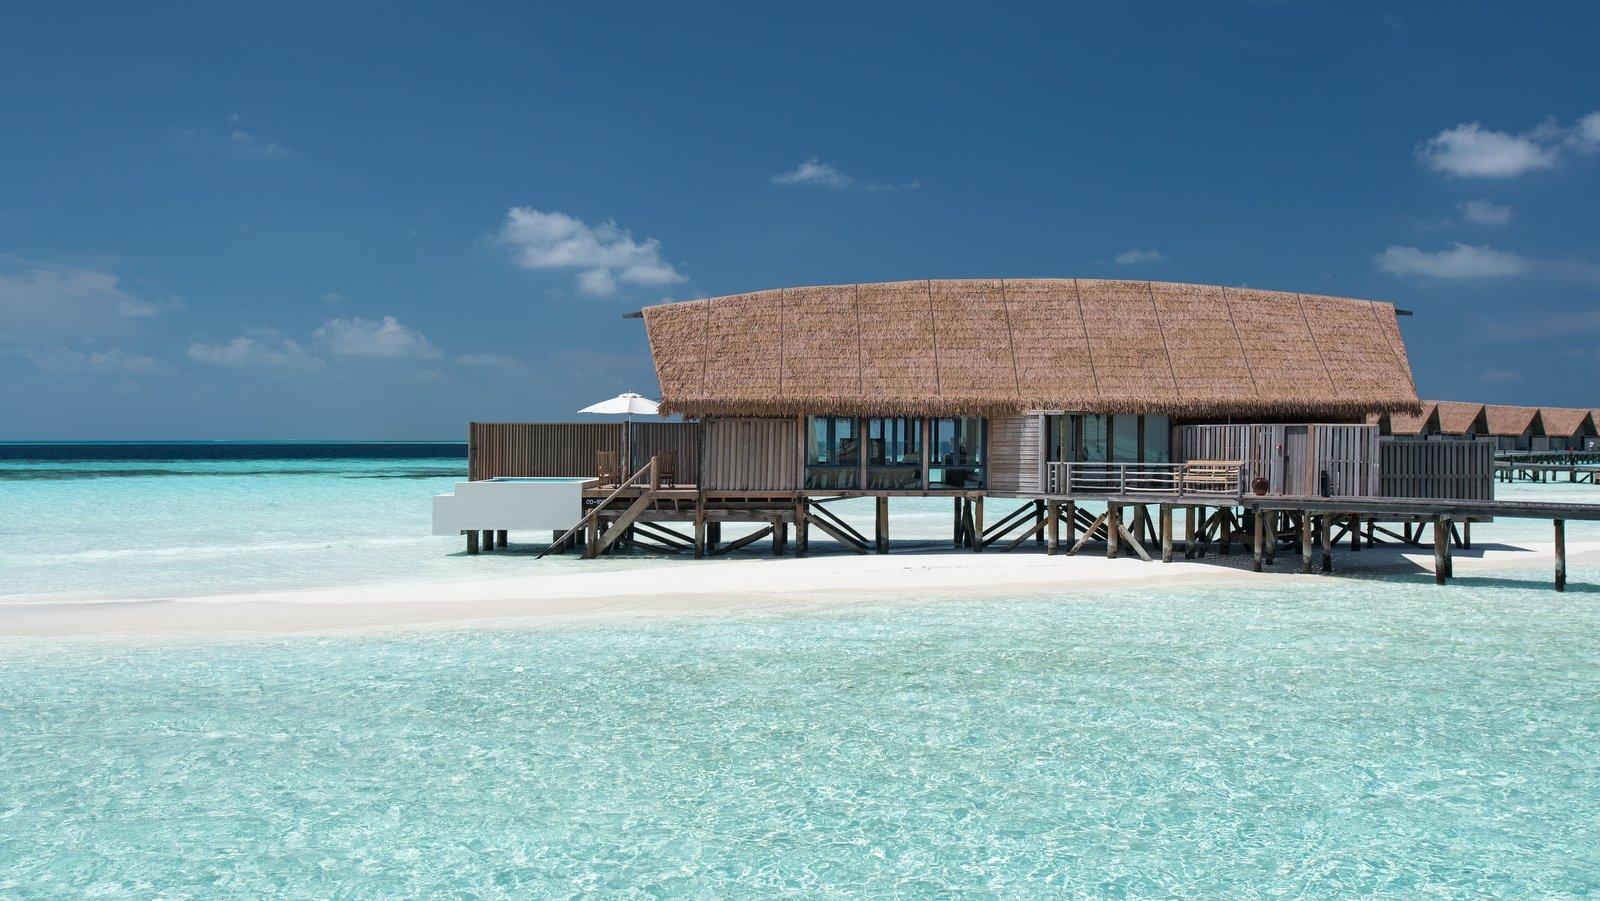 Мальдивы, Отель COMO Cocoa Island, номер One Bed Room Water Villa with Pool